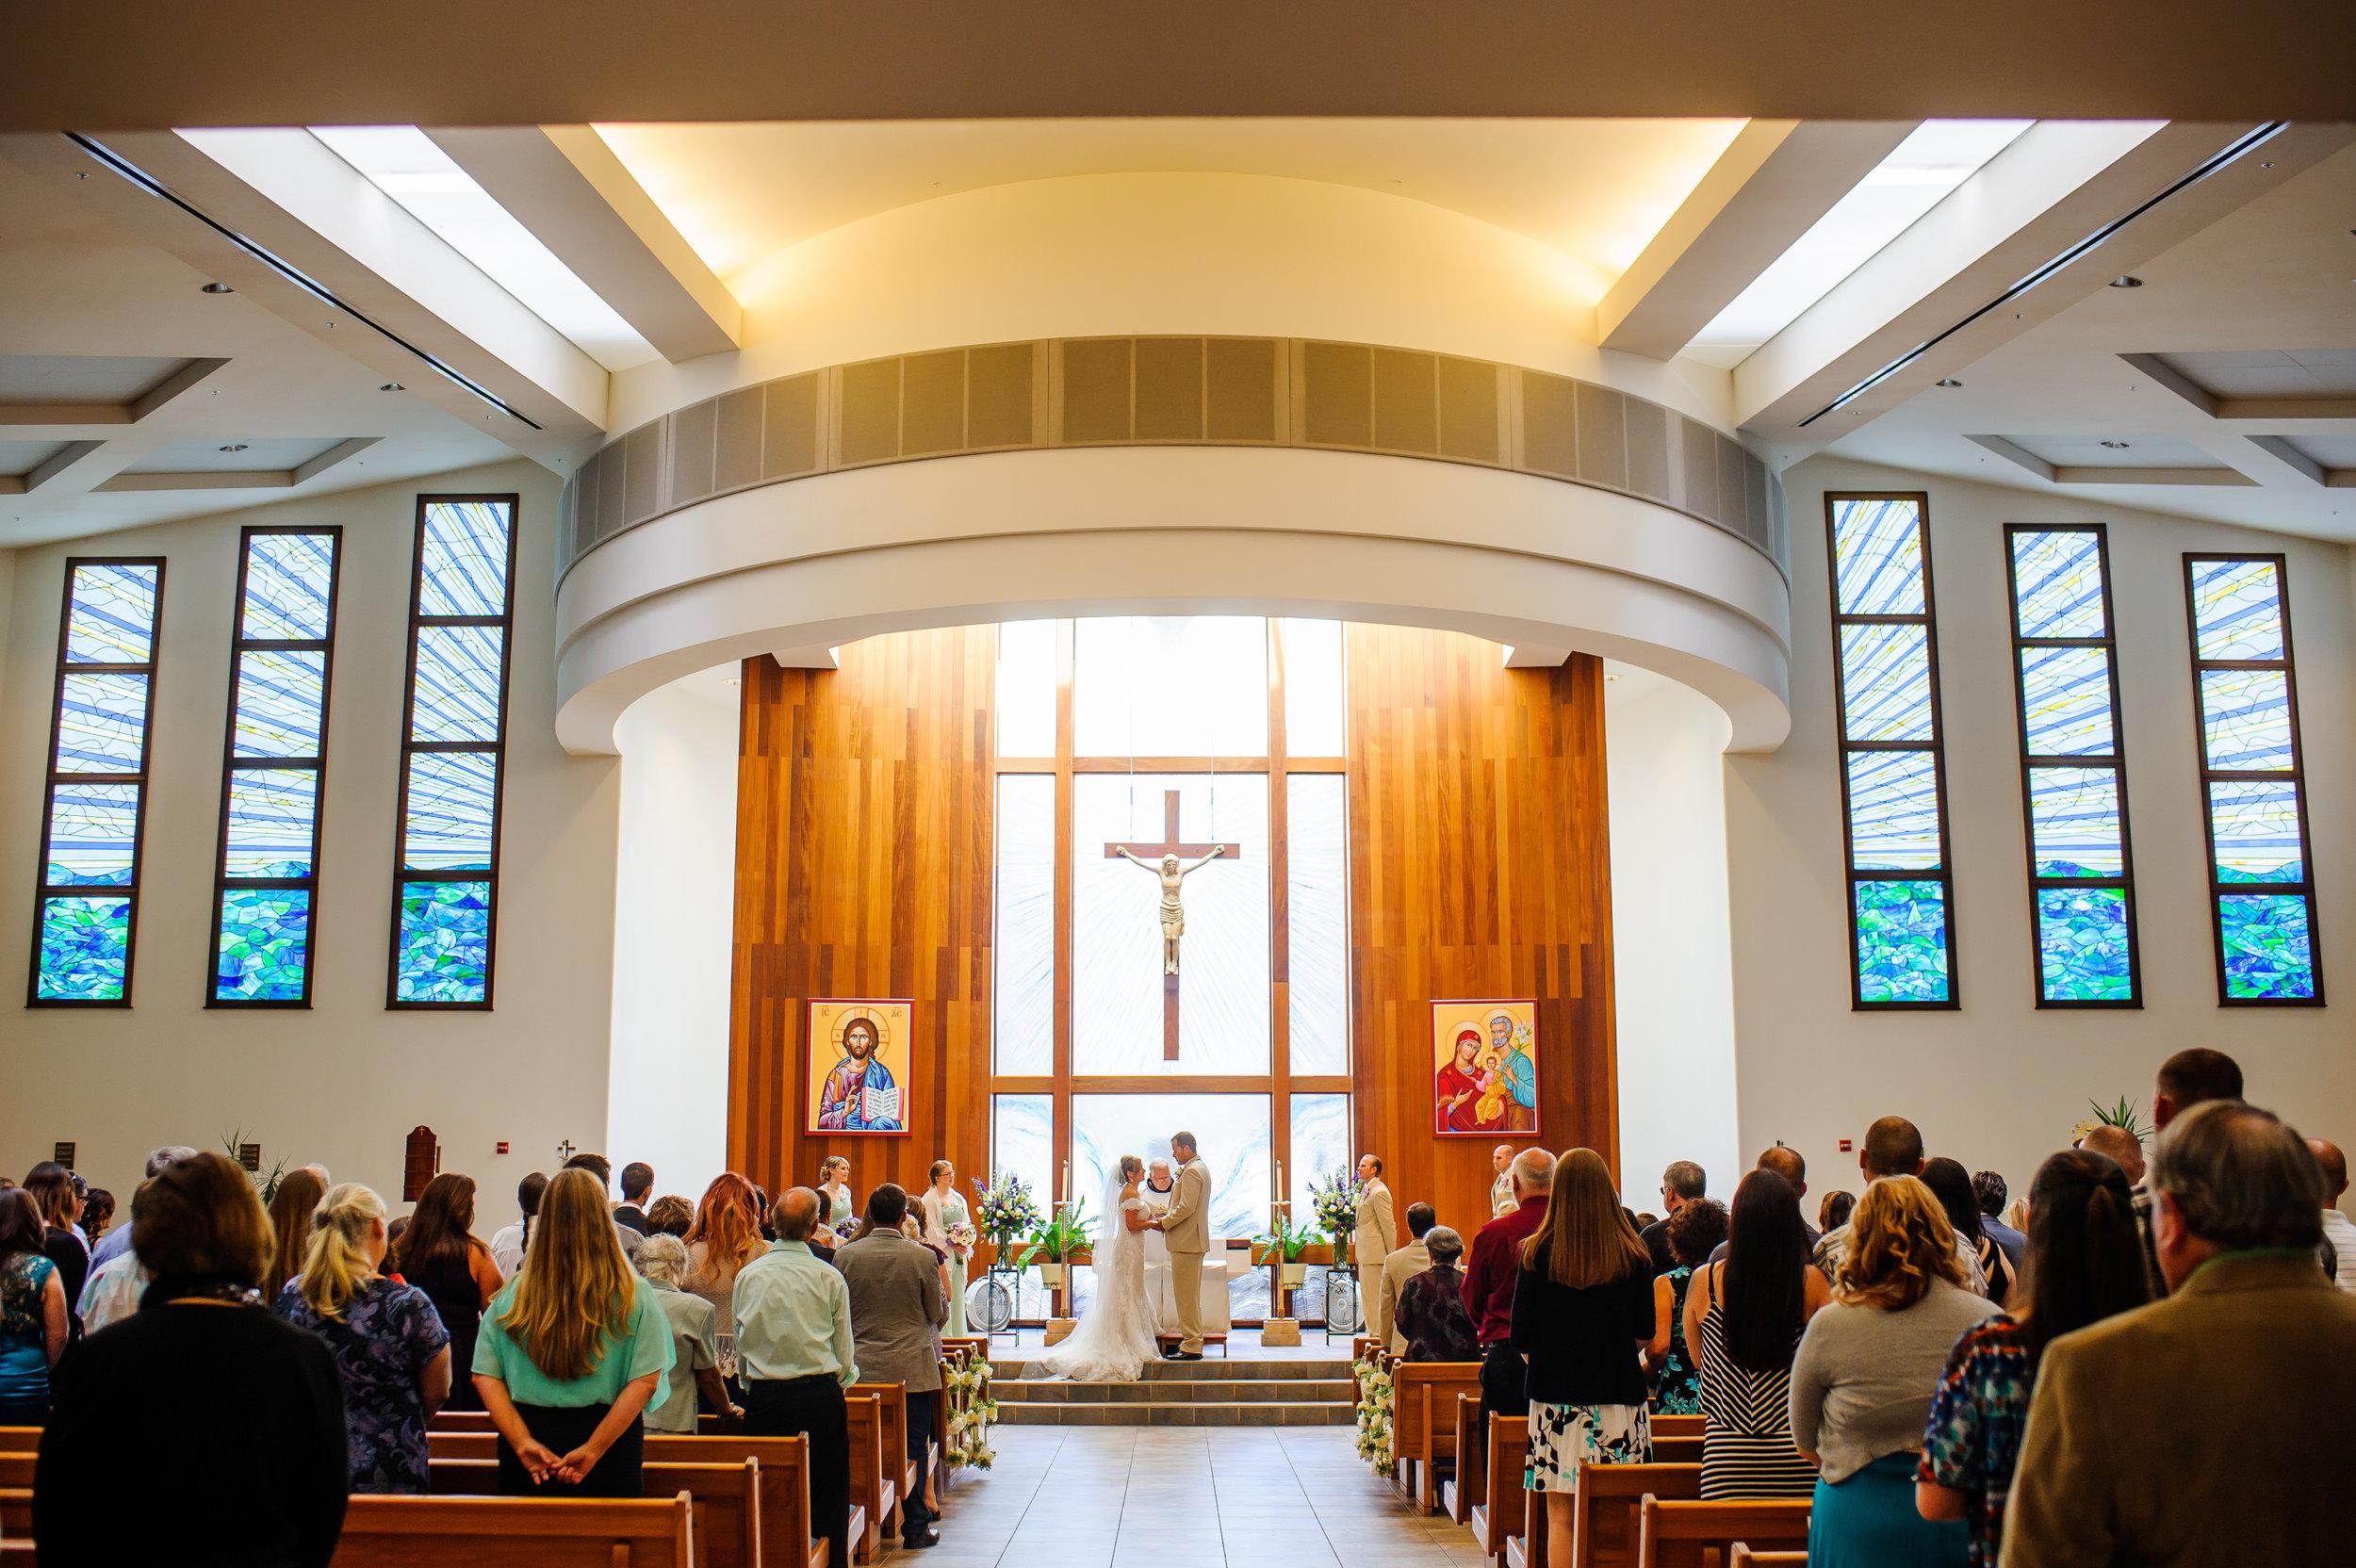 danielle-ross-009-sacramento-wedding-photographer-katherine-nicole-photography.JPG